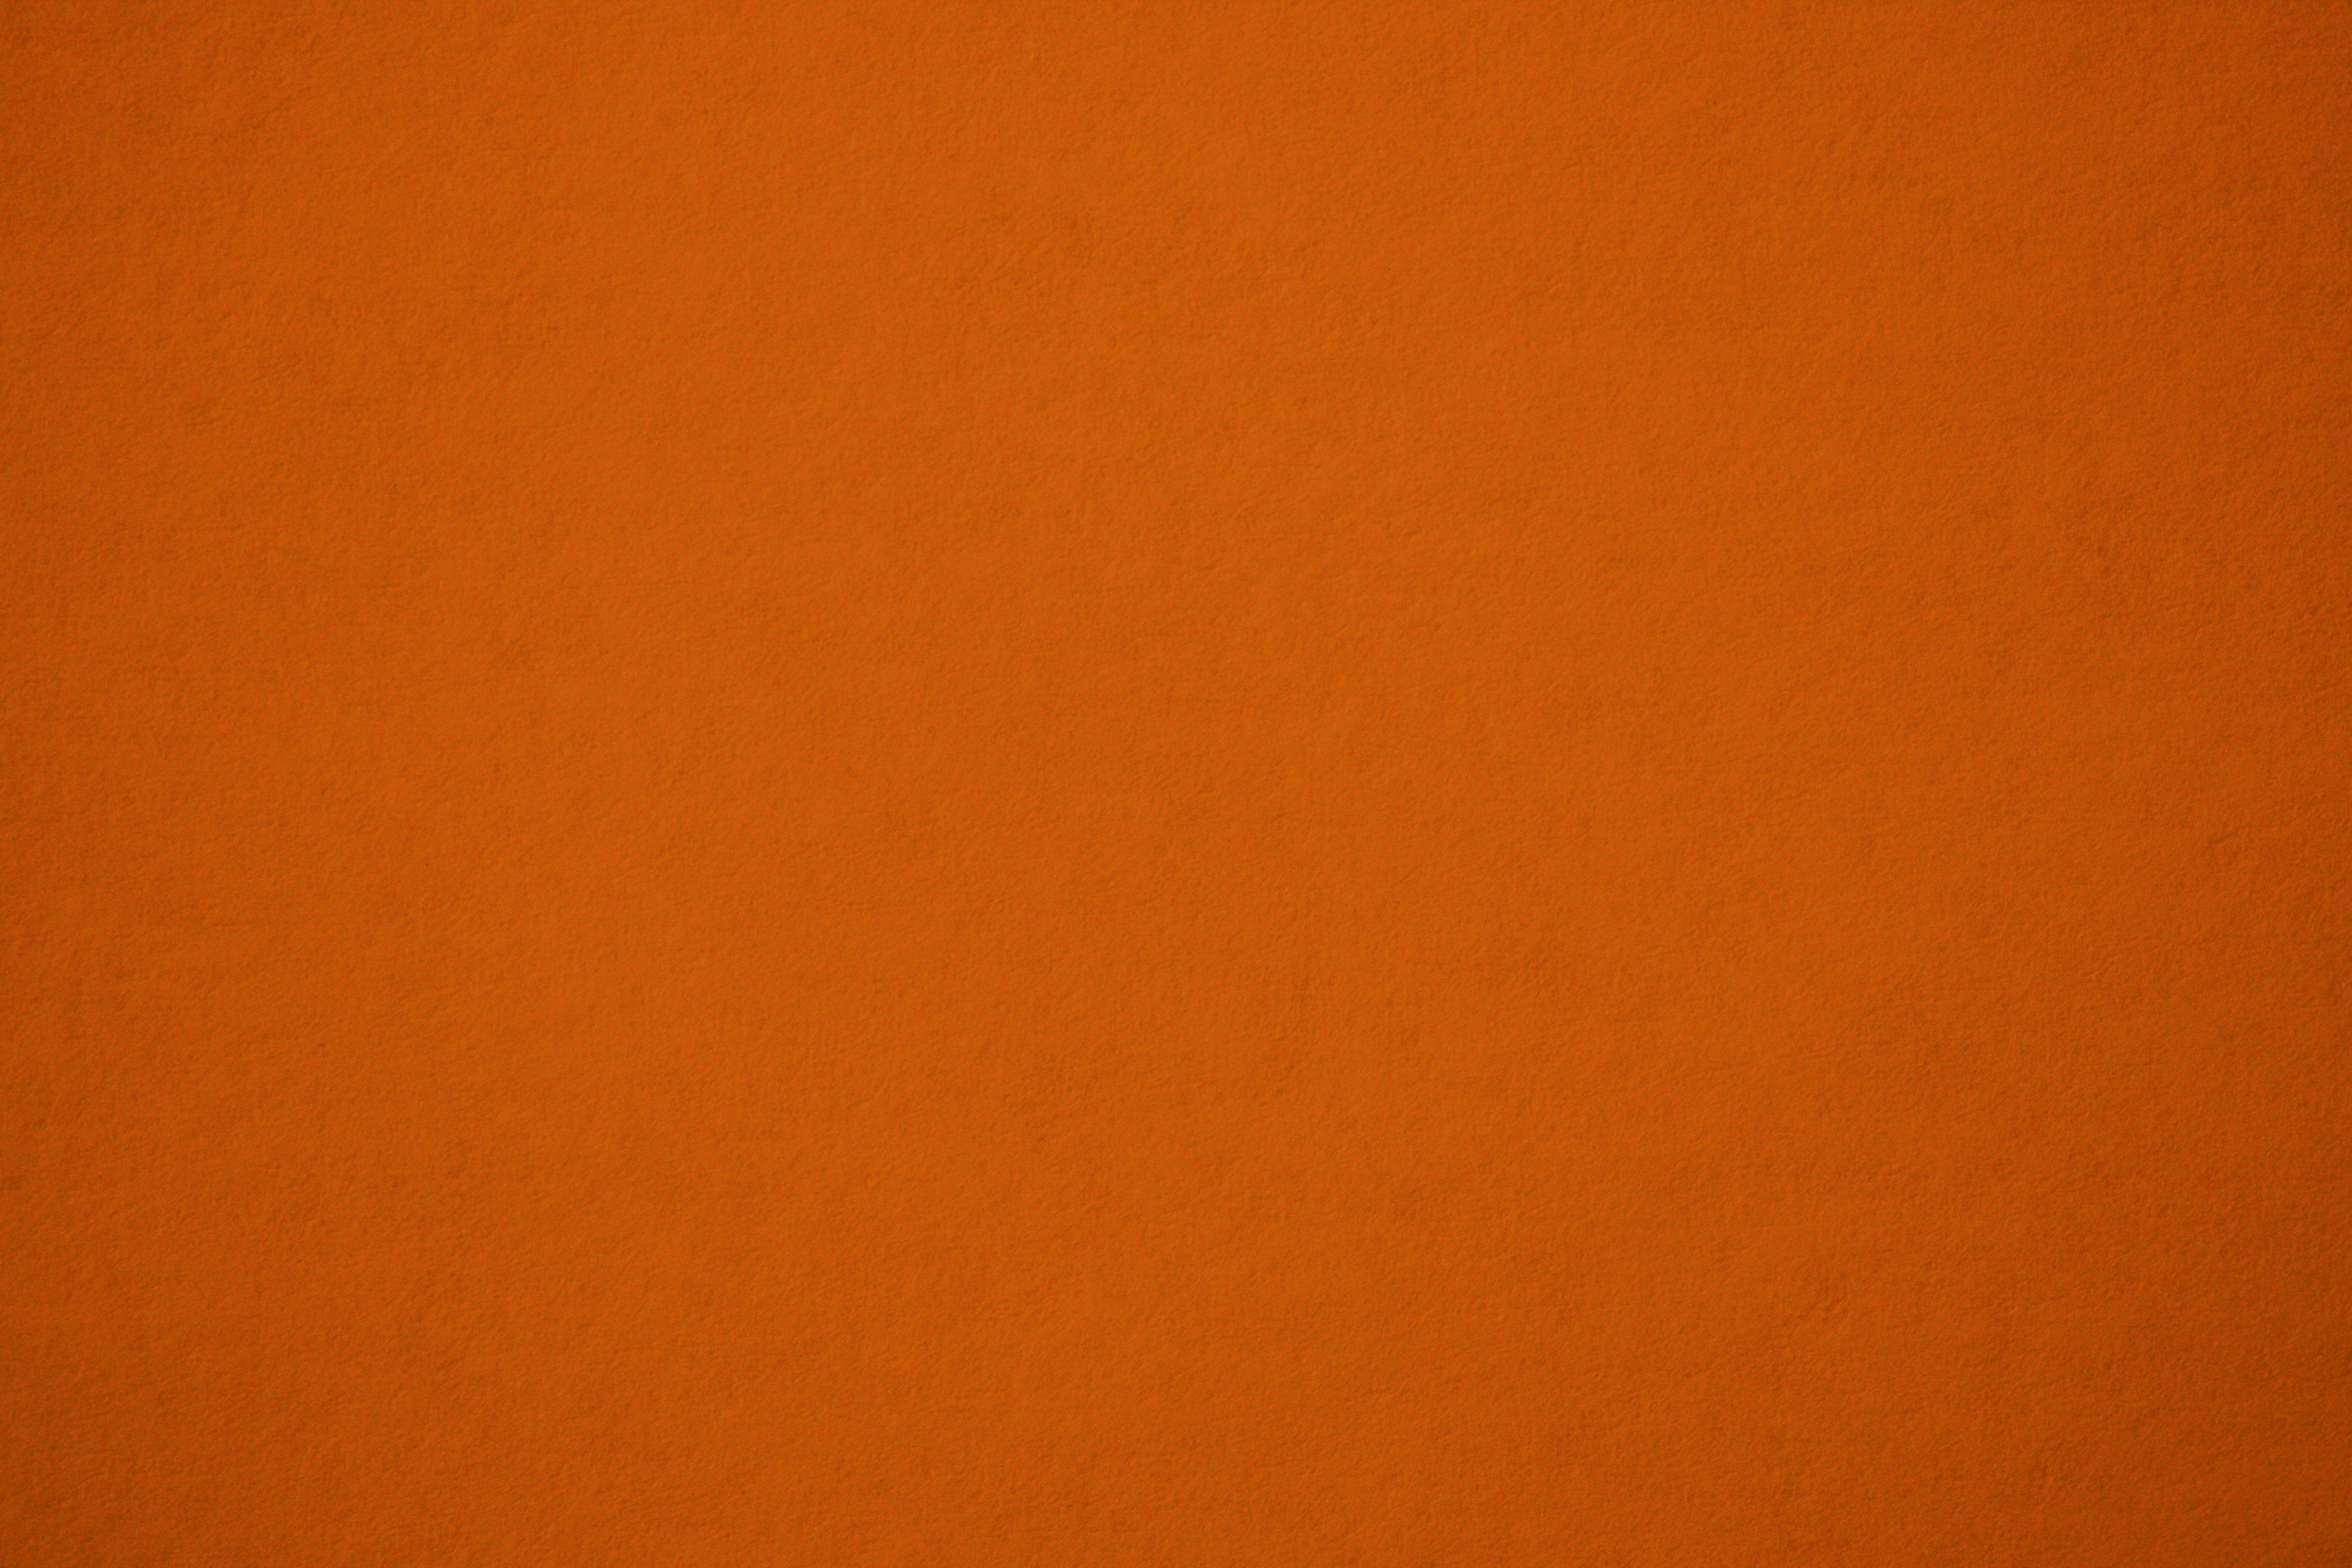 Orange Paper Texture Picture | Free Photograph | Photos ...